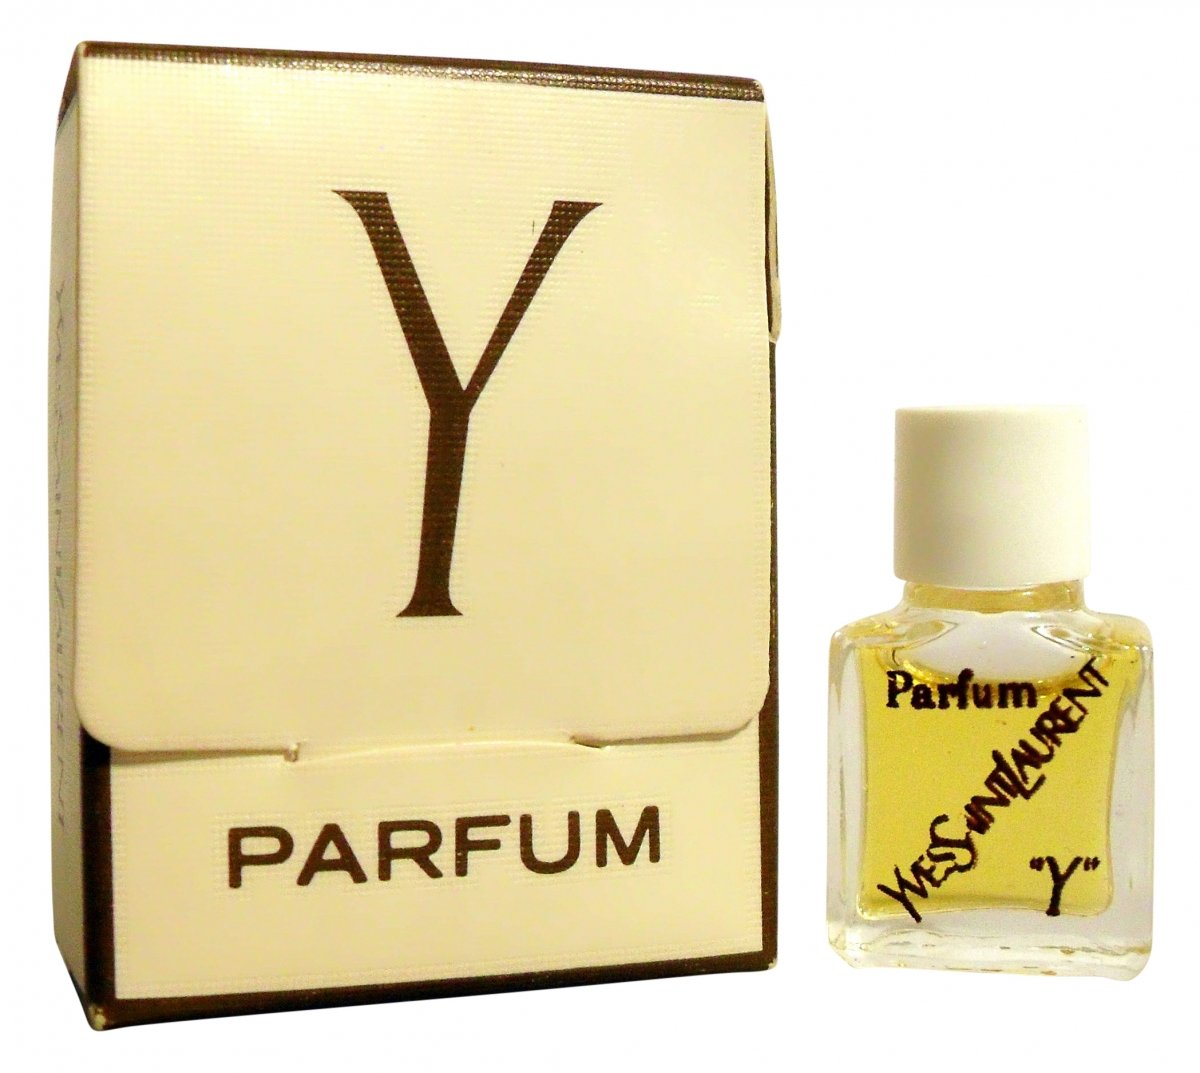 yves saint laurent y 1964 parfum reviews and rating. Black Bedroom Furniture Sets. Home Design Ideas